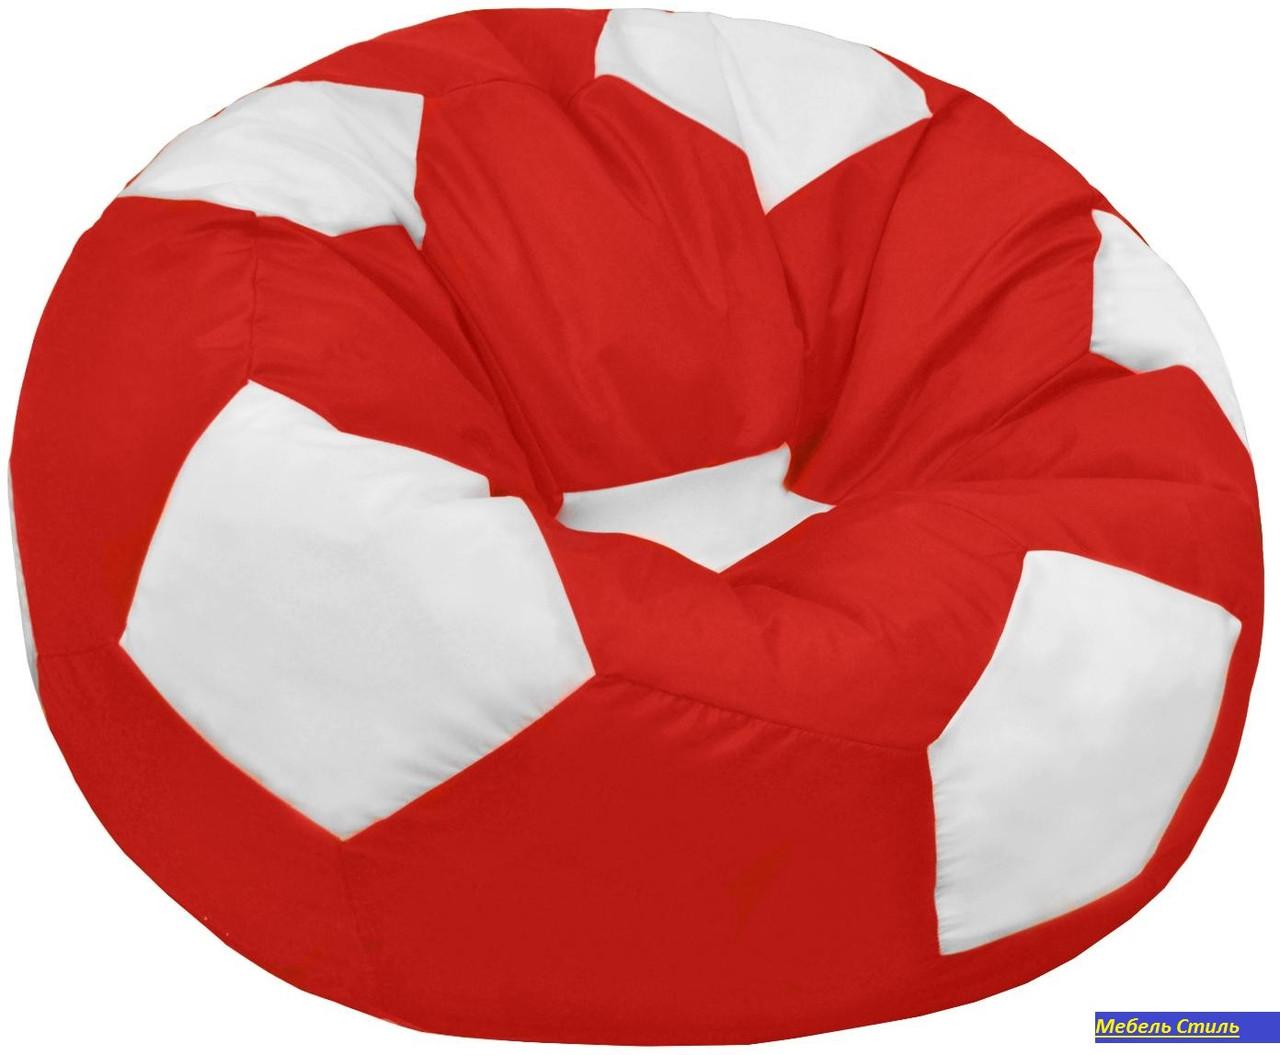 Пуф-мешок Мяч БМО6 красно-белый 110Х110см.